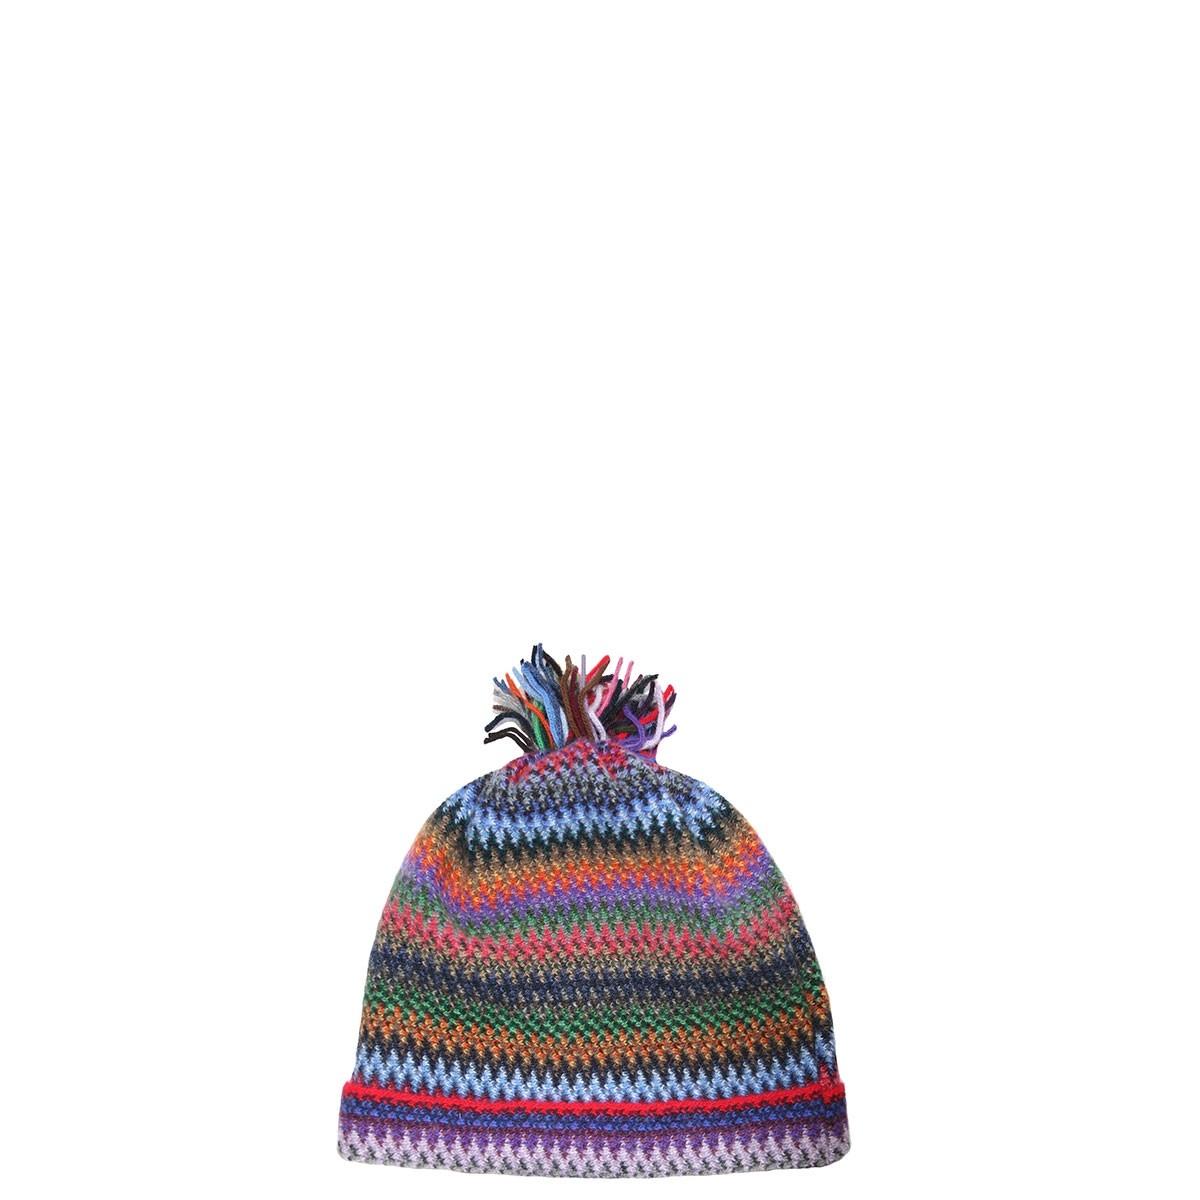 Tropic Faith Wool/Angora Knitted Hat